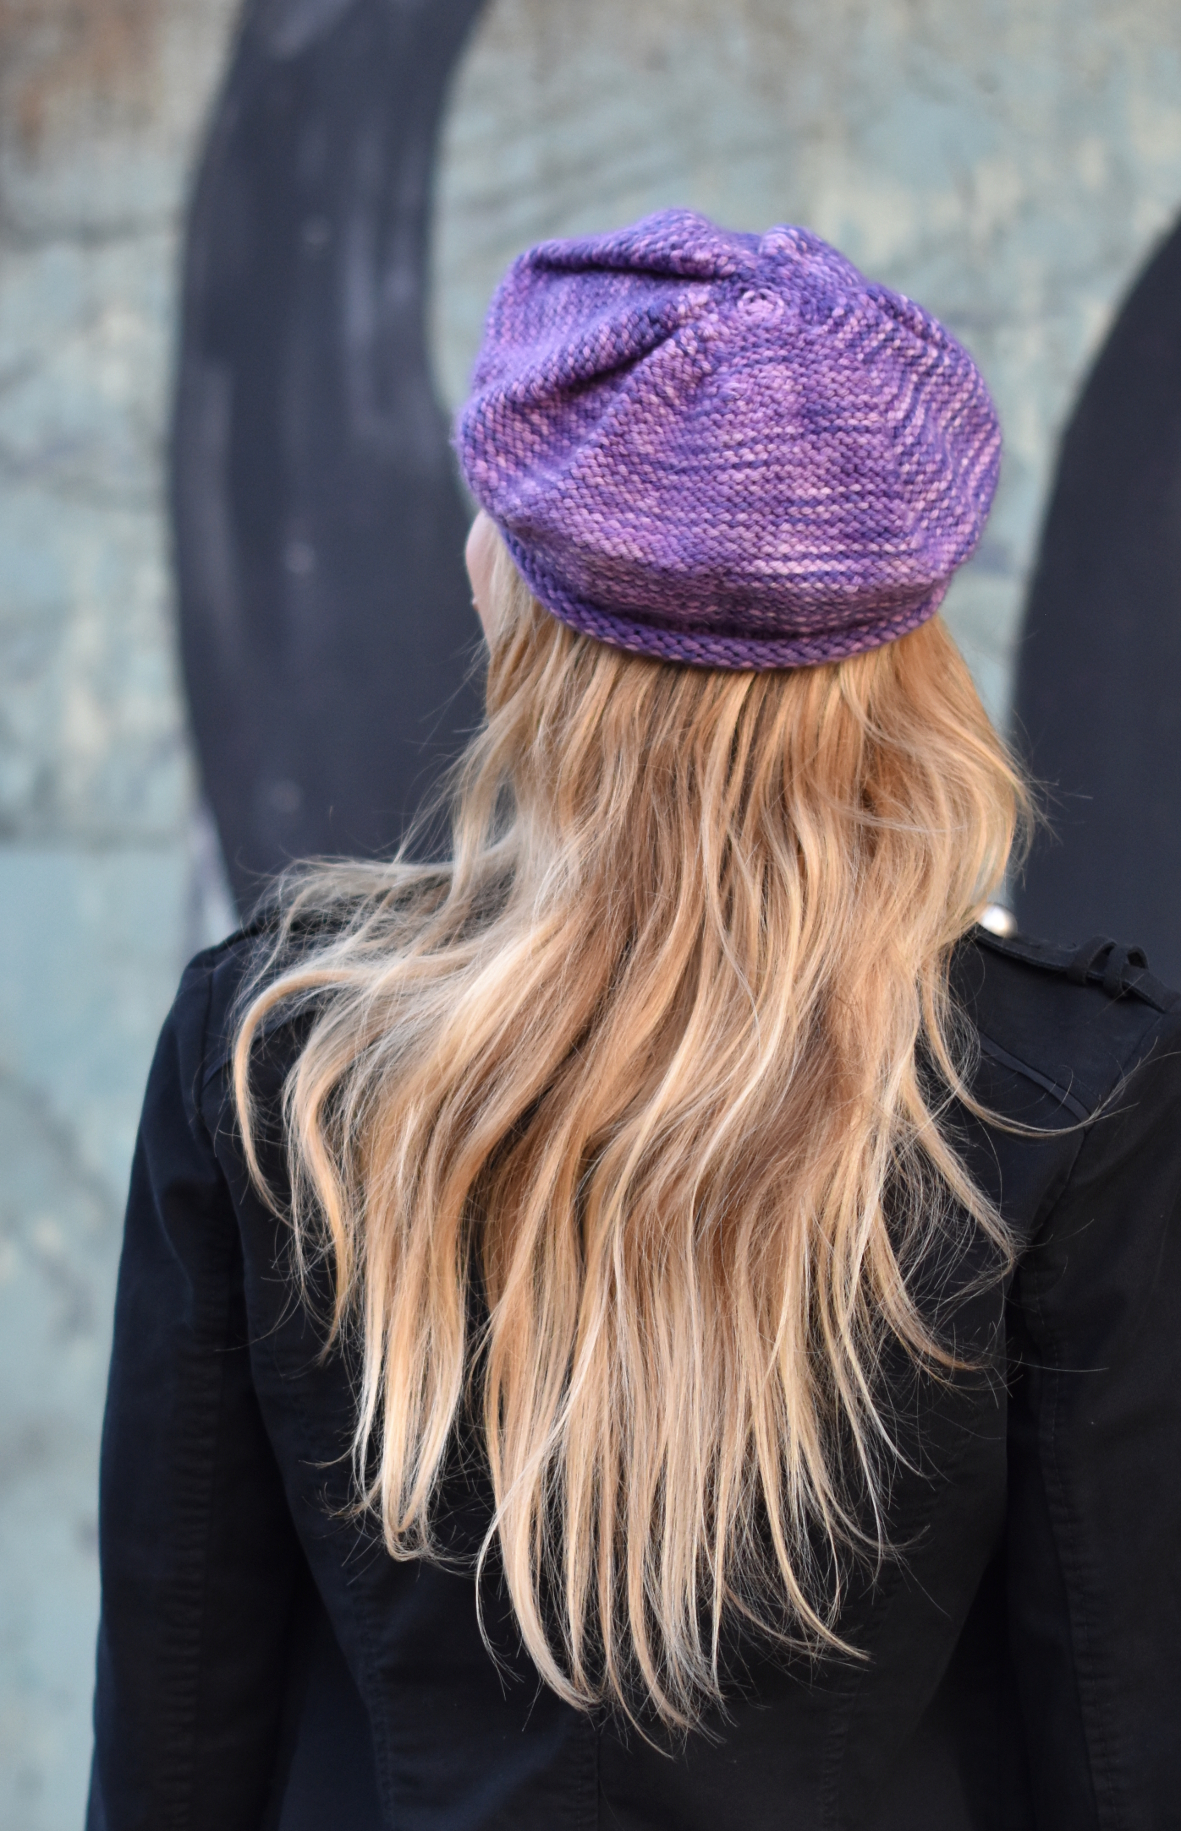 Urchin Cap knitting pattern for variegated yarn